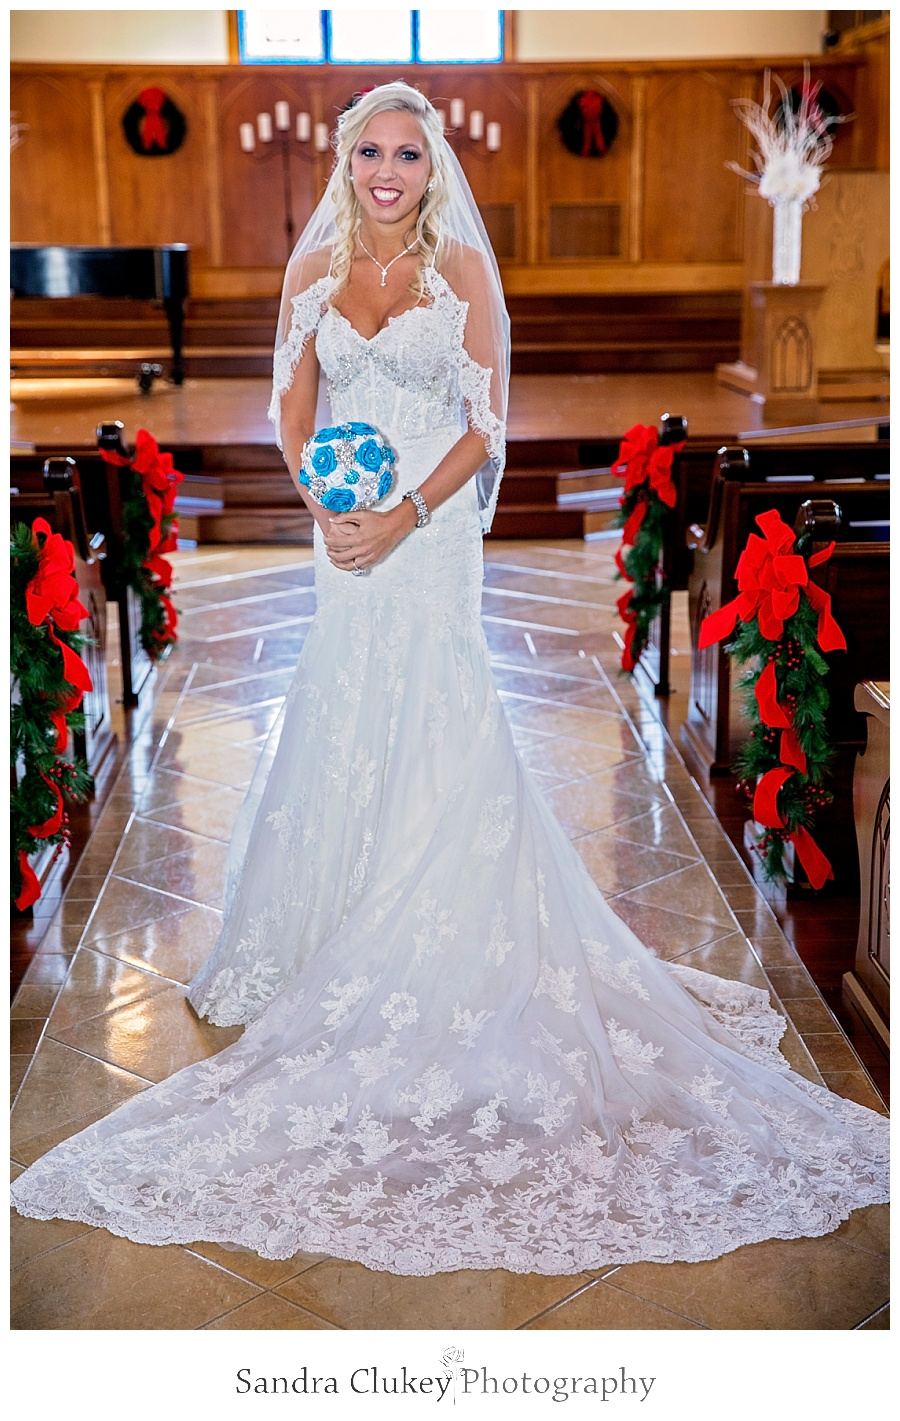 Dazzling bride in chapel